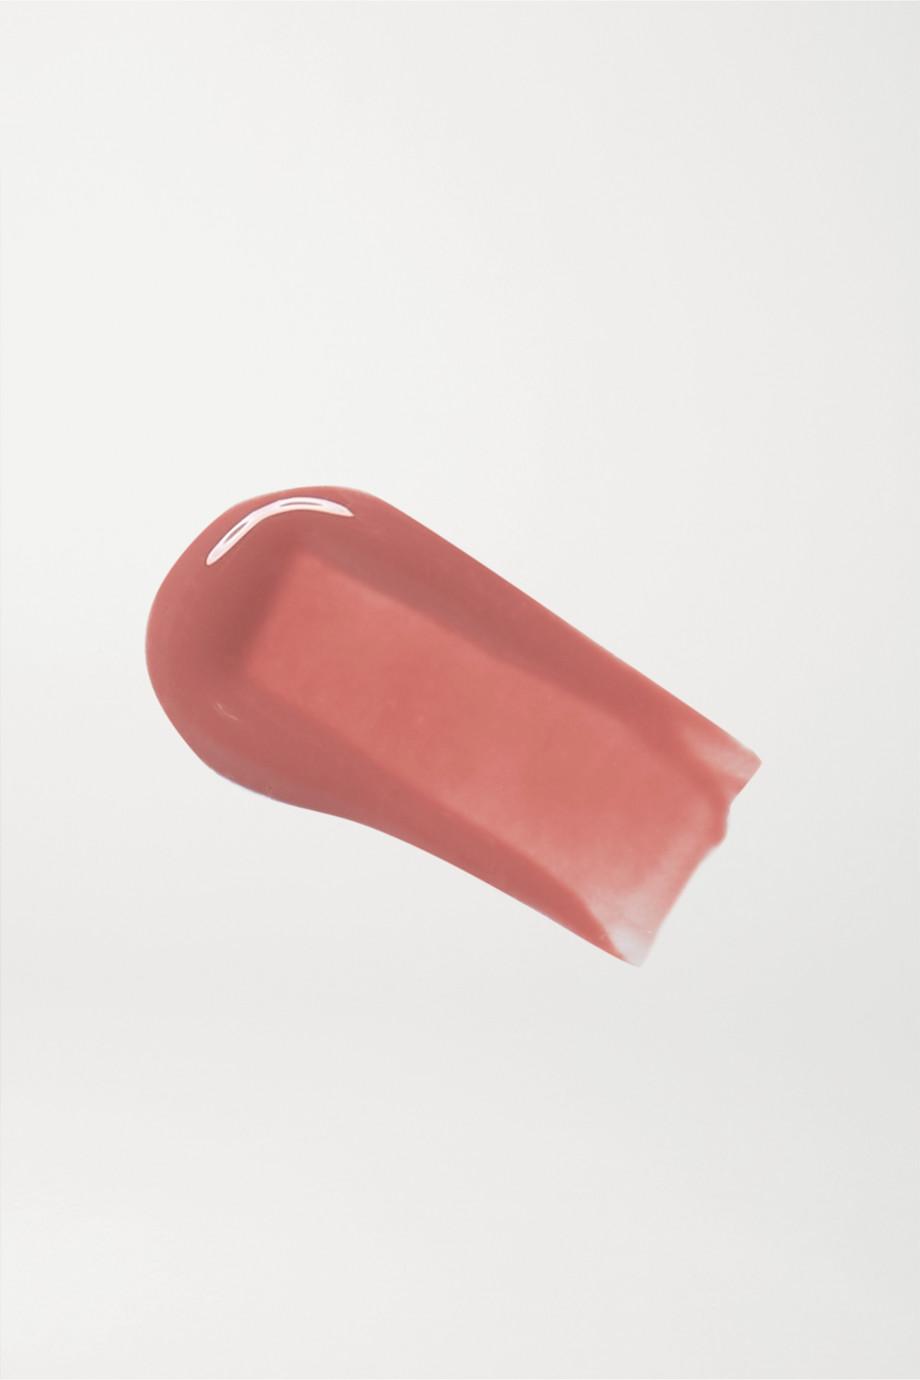 Bobbi Brown Crushed Oil-Infused Gloss - Free Spirit